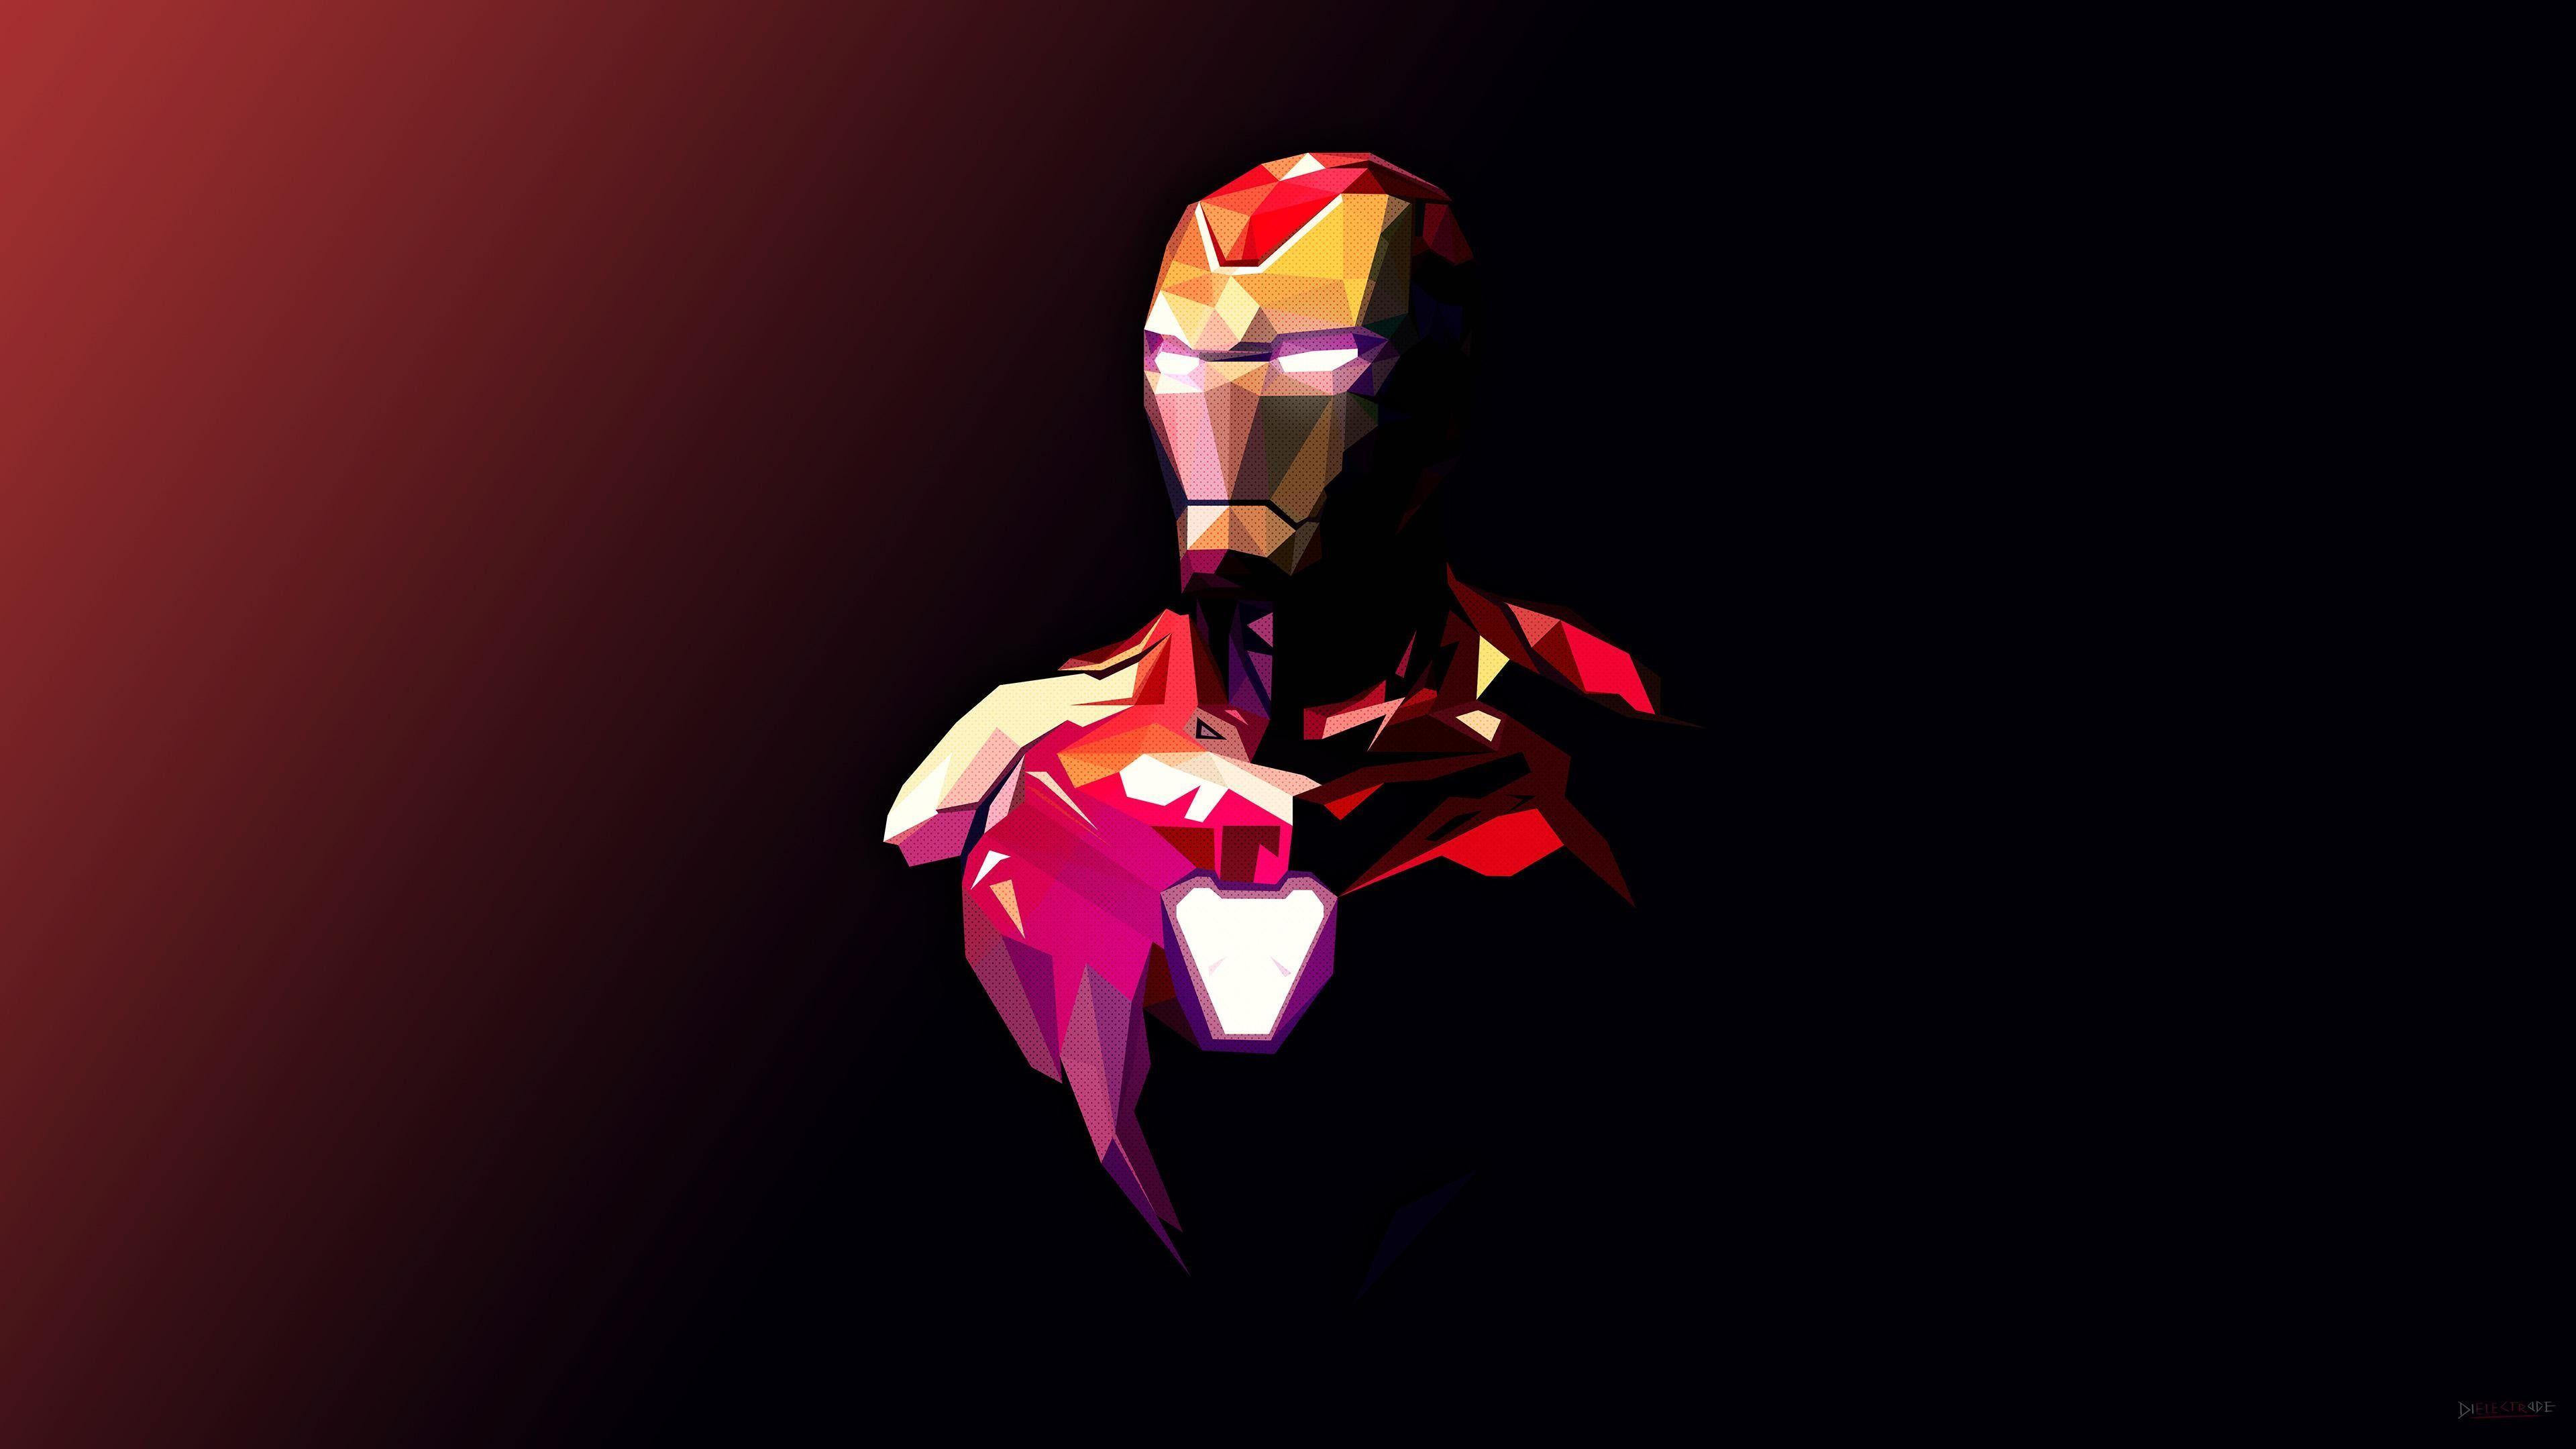 Unlimited Avengers Wallpapers 4k Fhd Hd Download For Free 2020 In 2020 Avengers Wallpaper Superhero Wallpaper Captain America Wallpaper